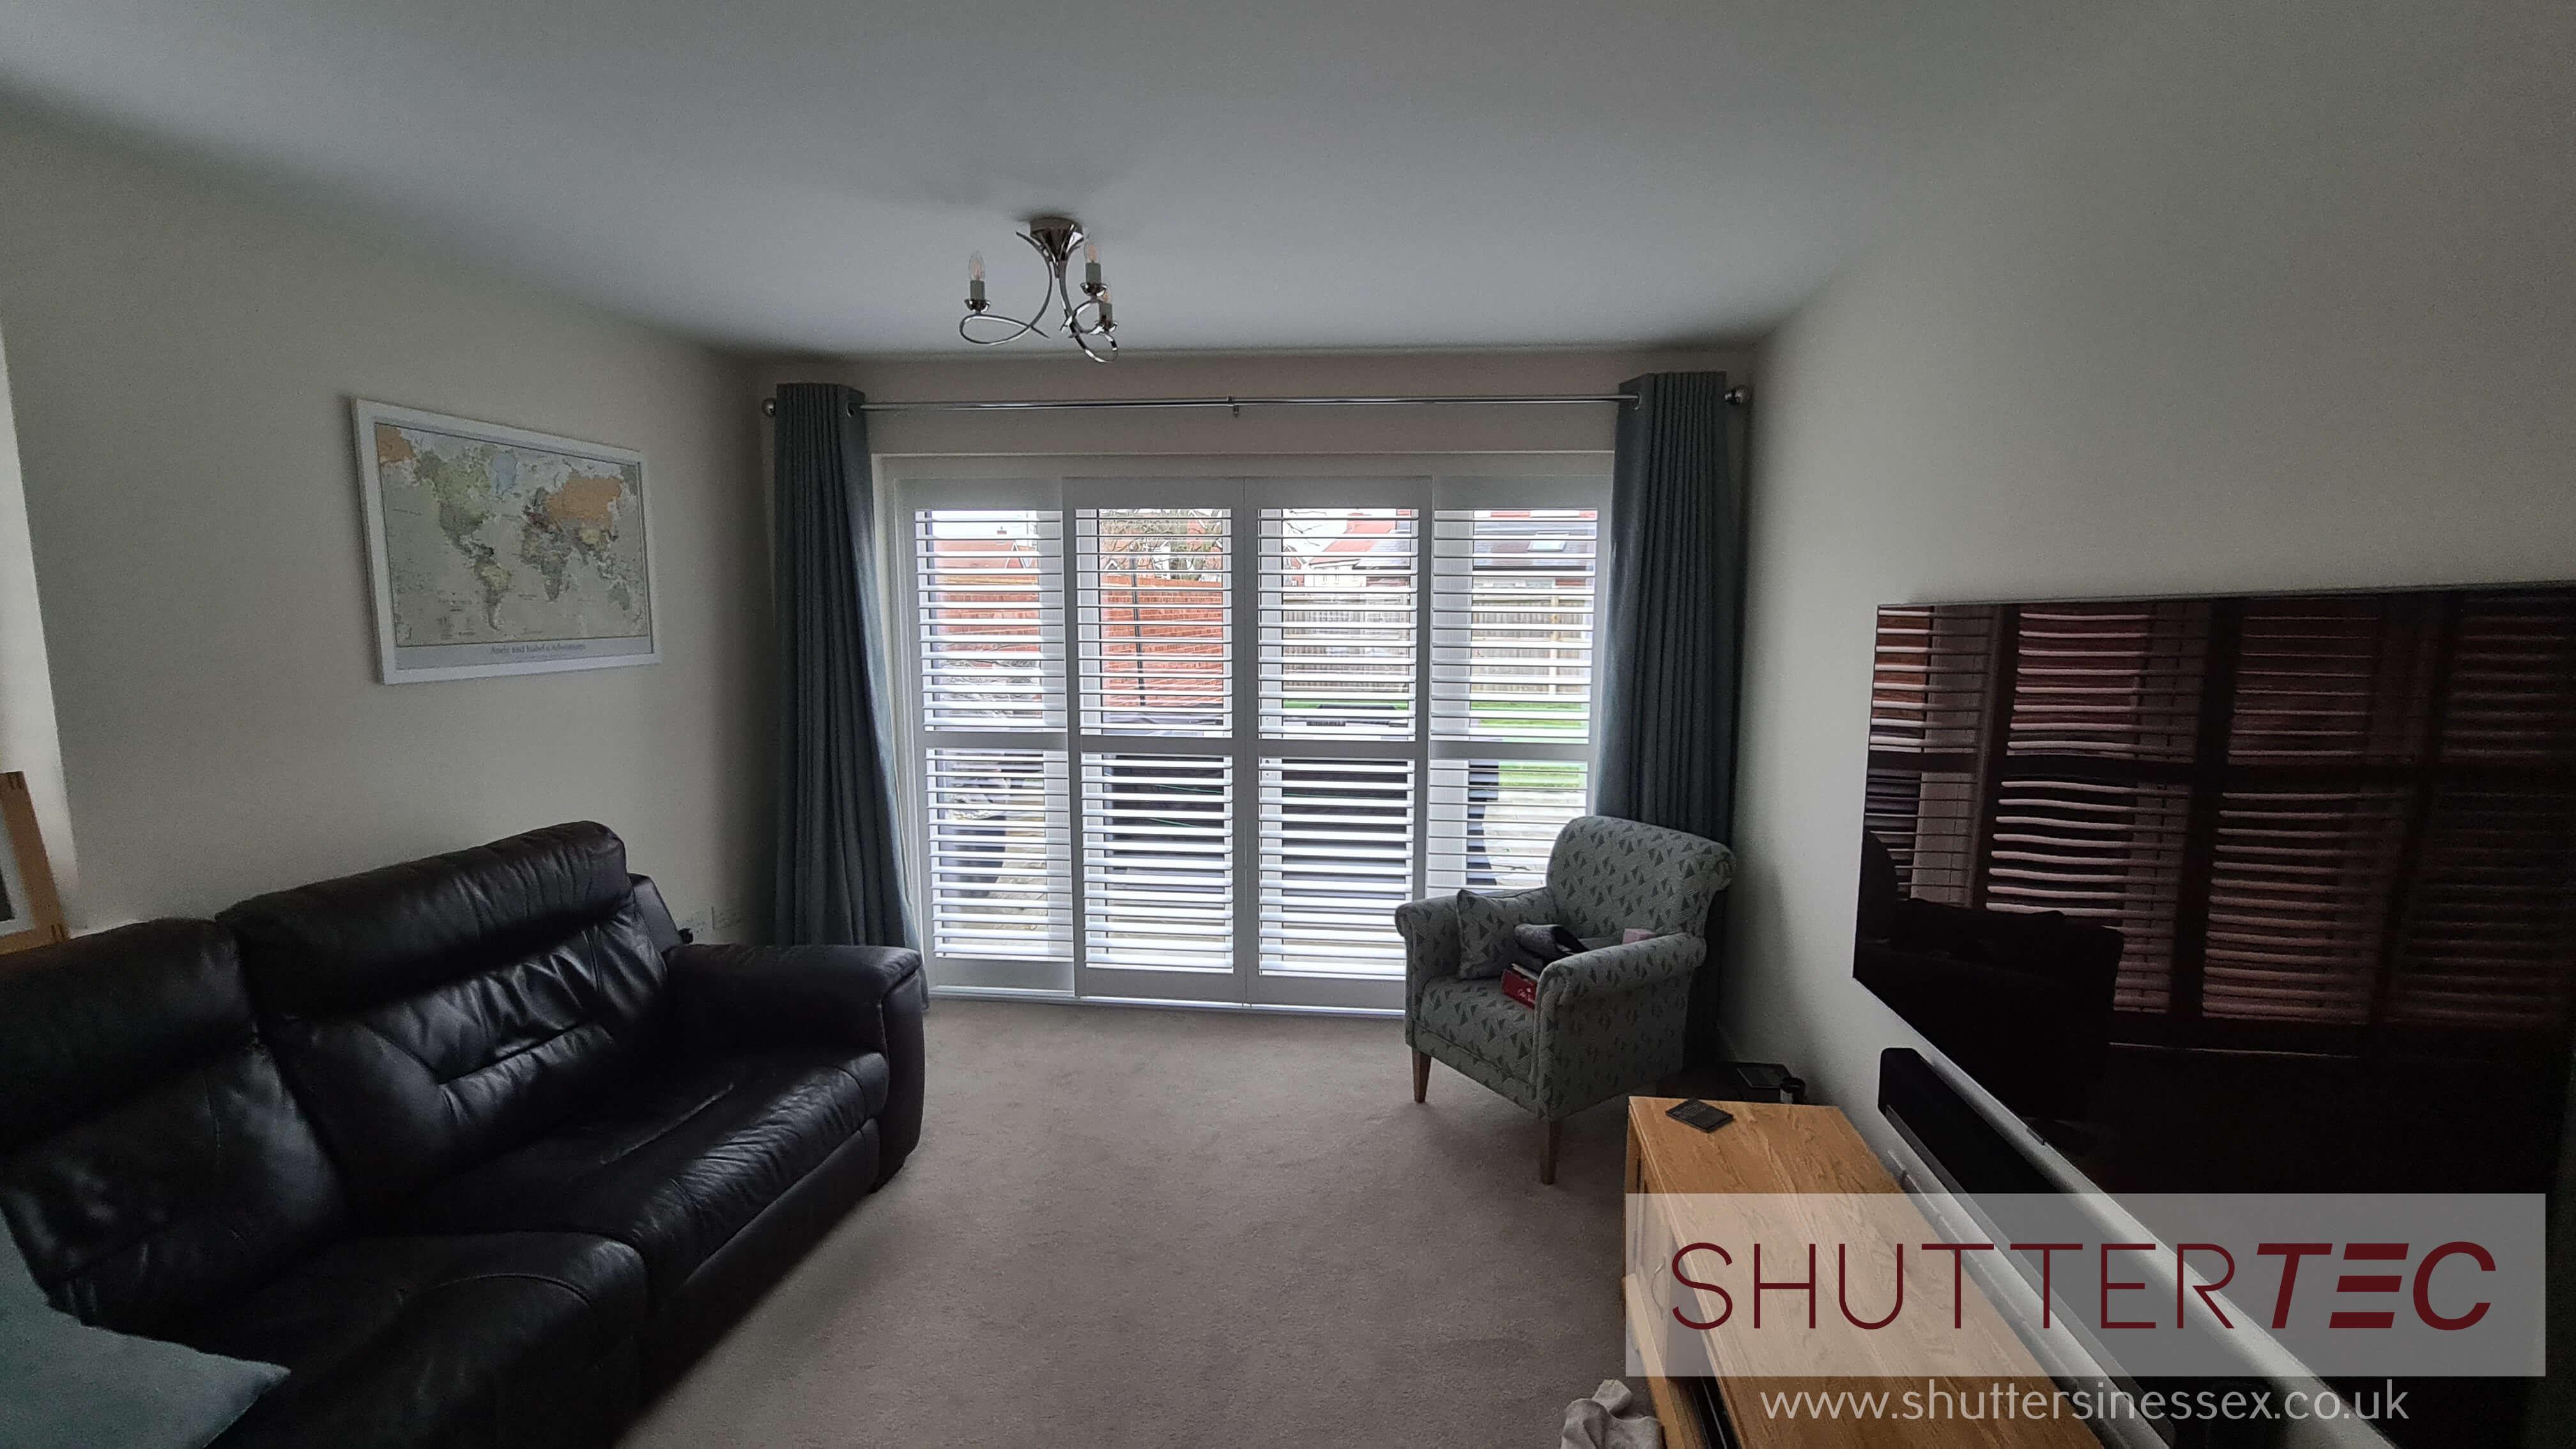 Essex shutters